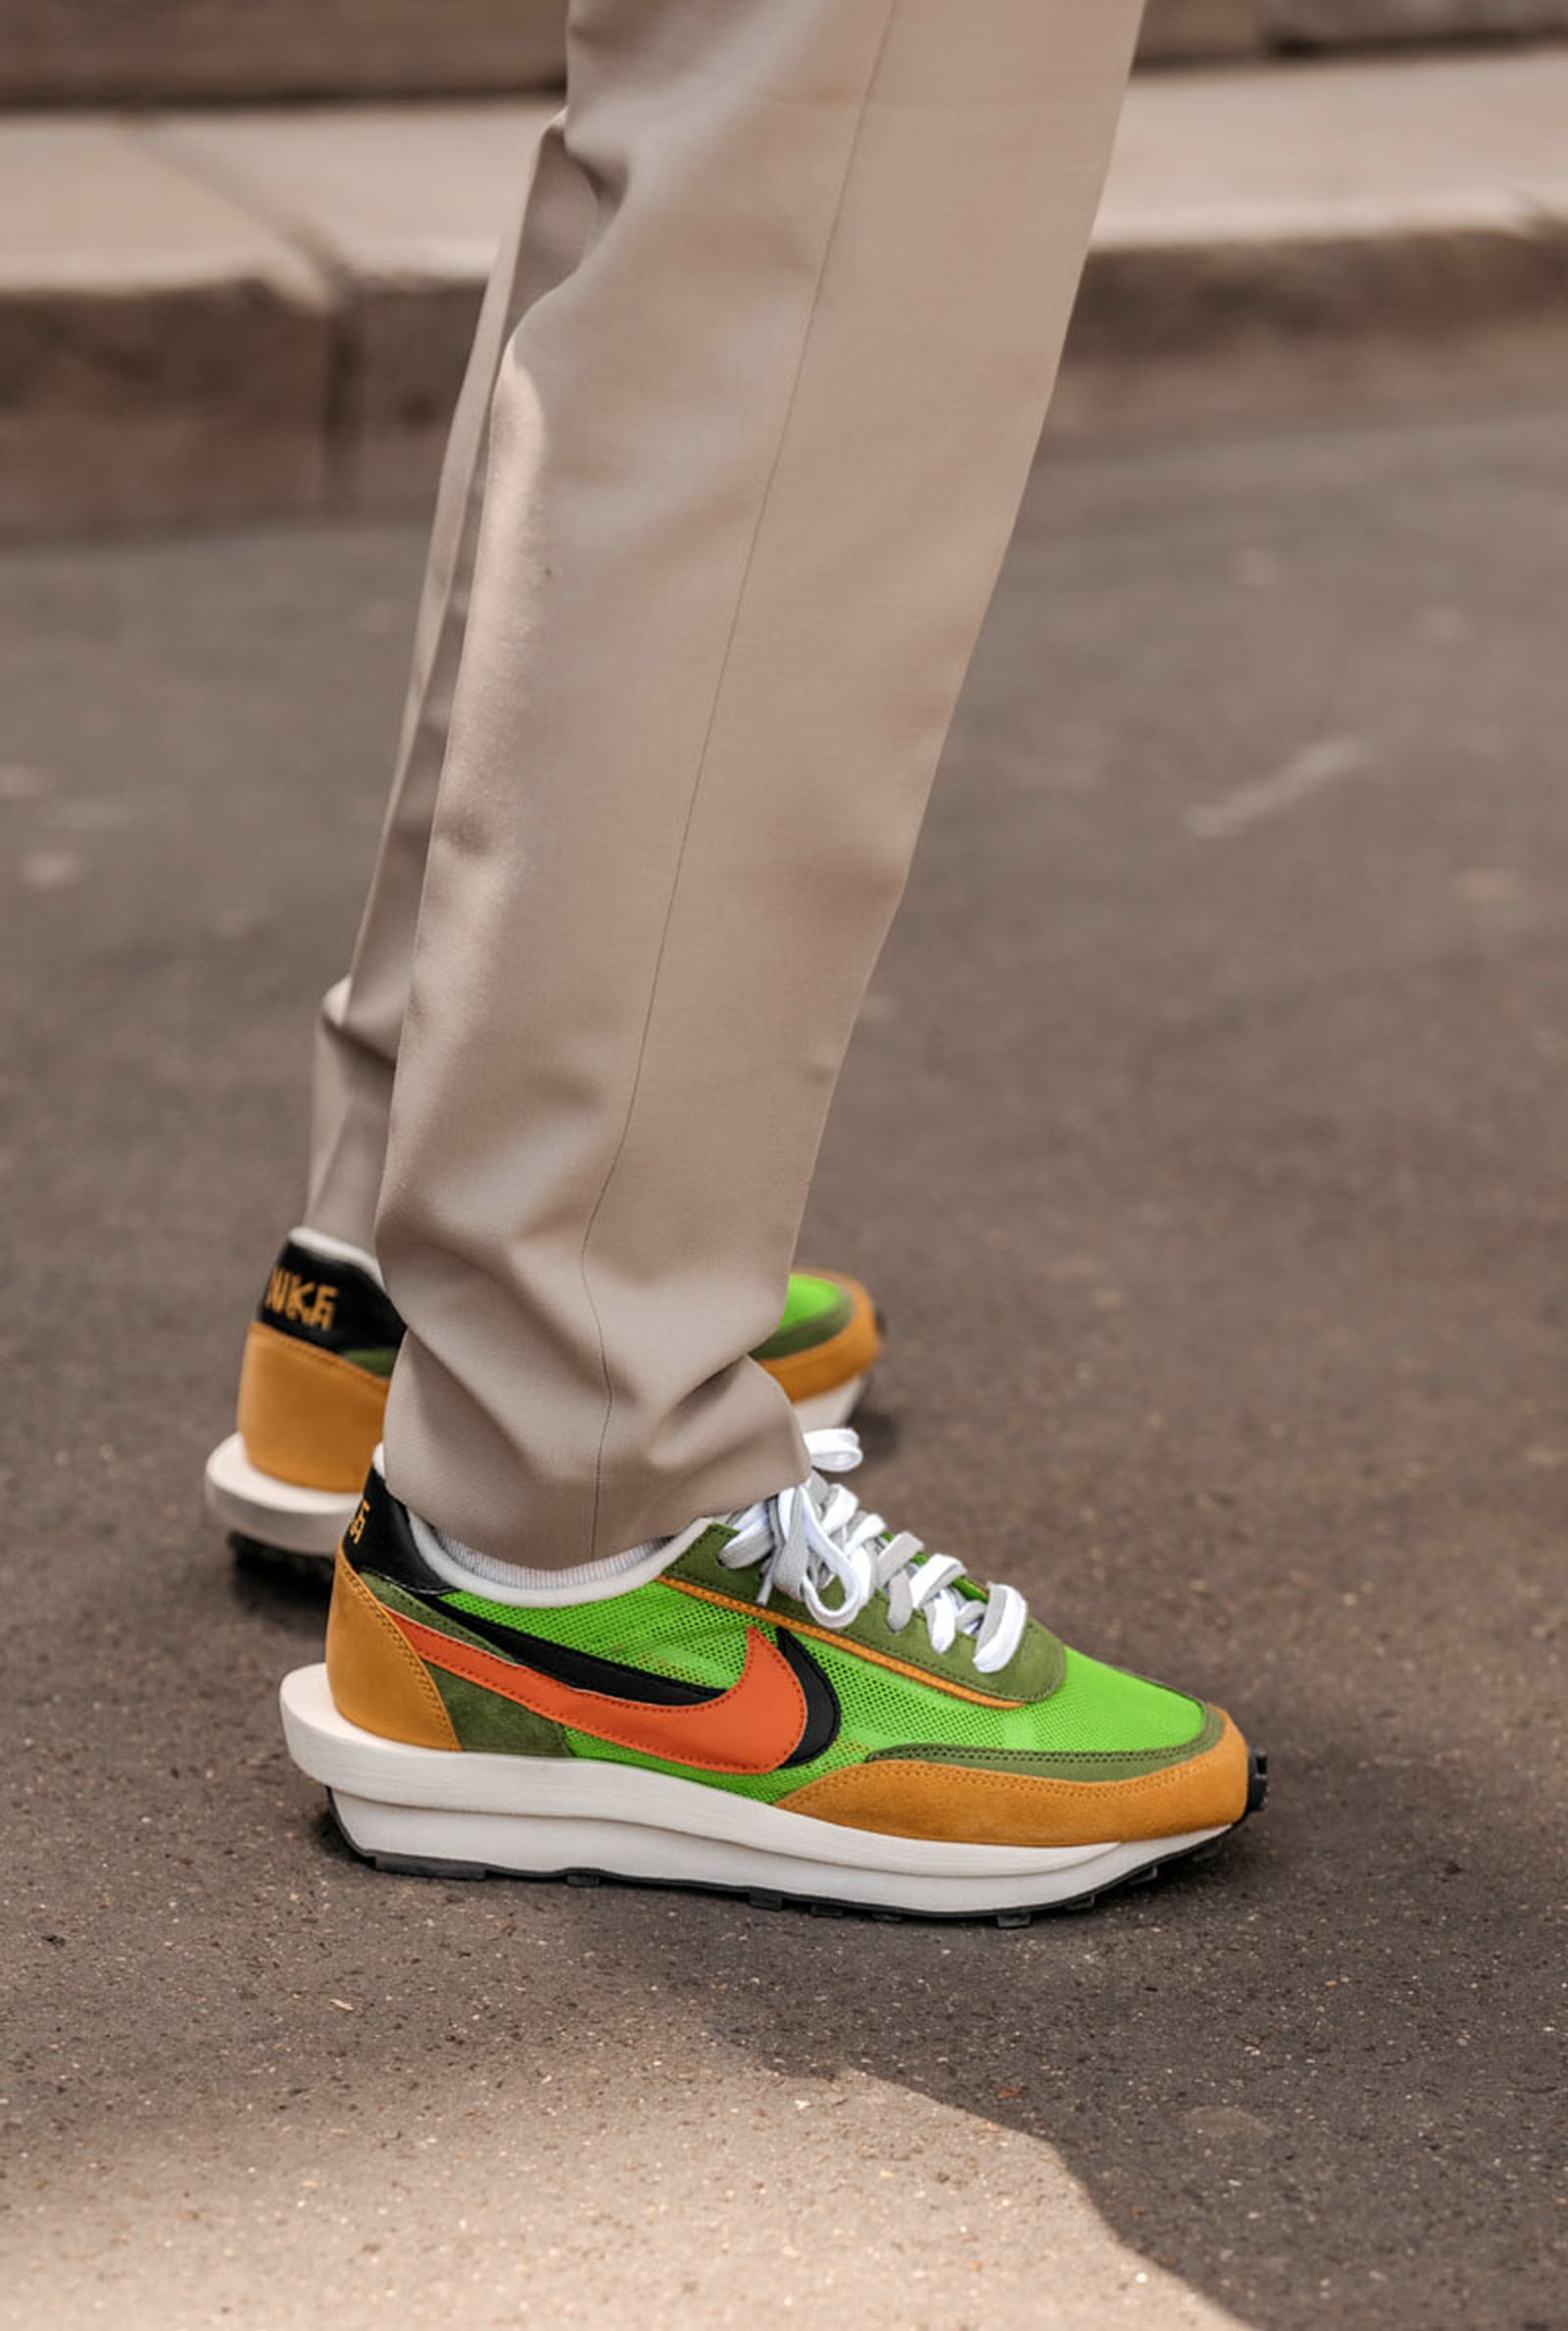 paris fashion week ss20 sneakers 01 Nike comme des garcons li ning